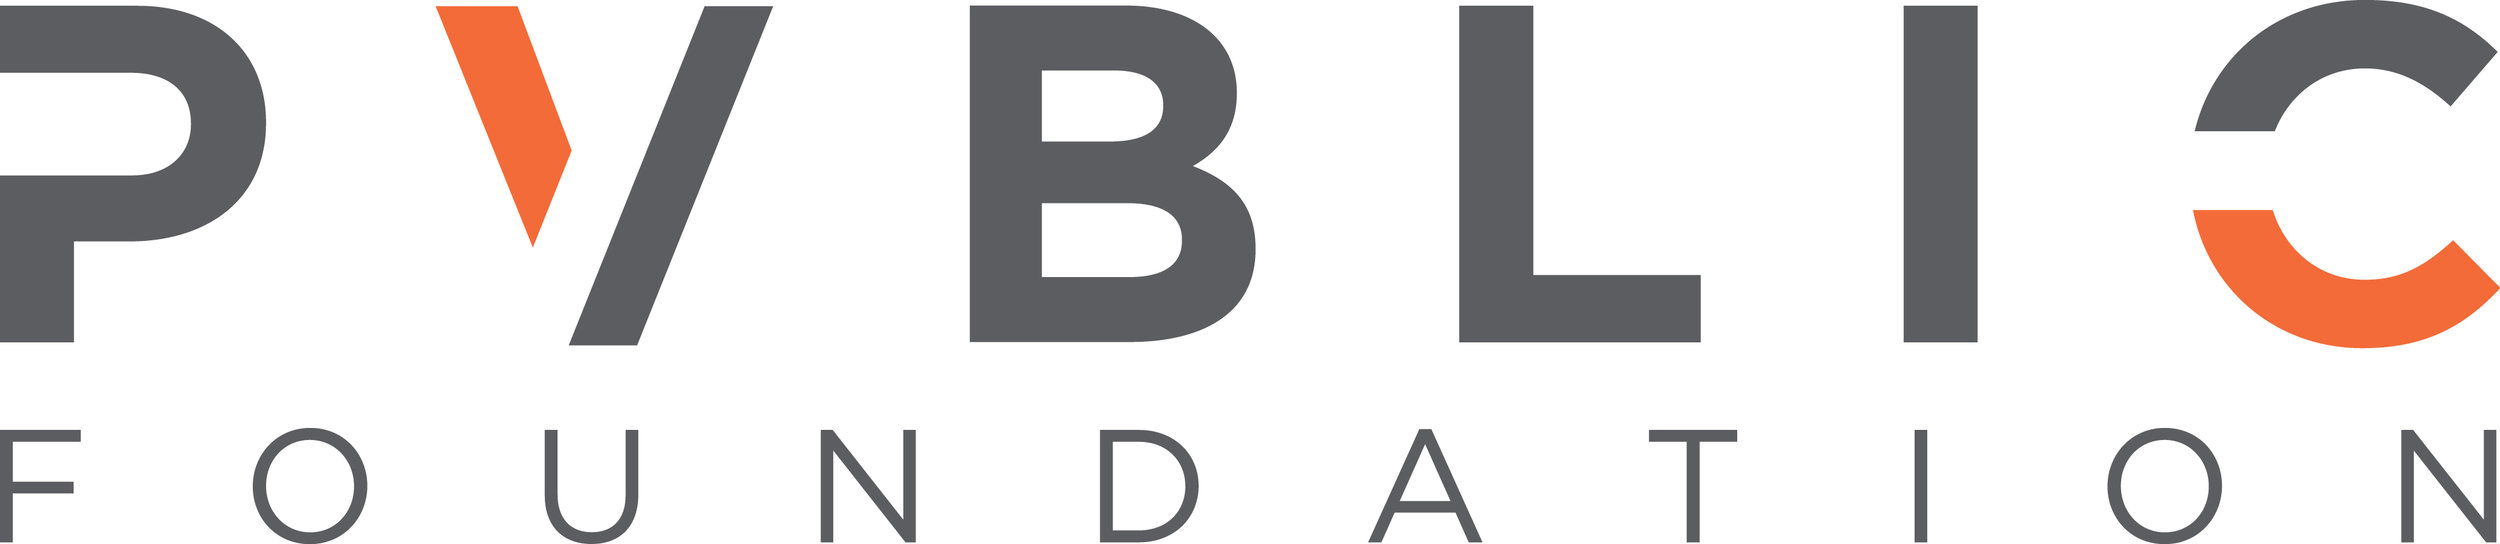 pvlbic-logo.jpg